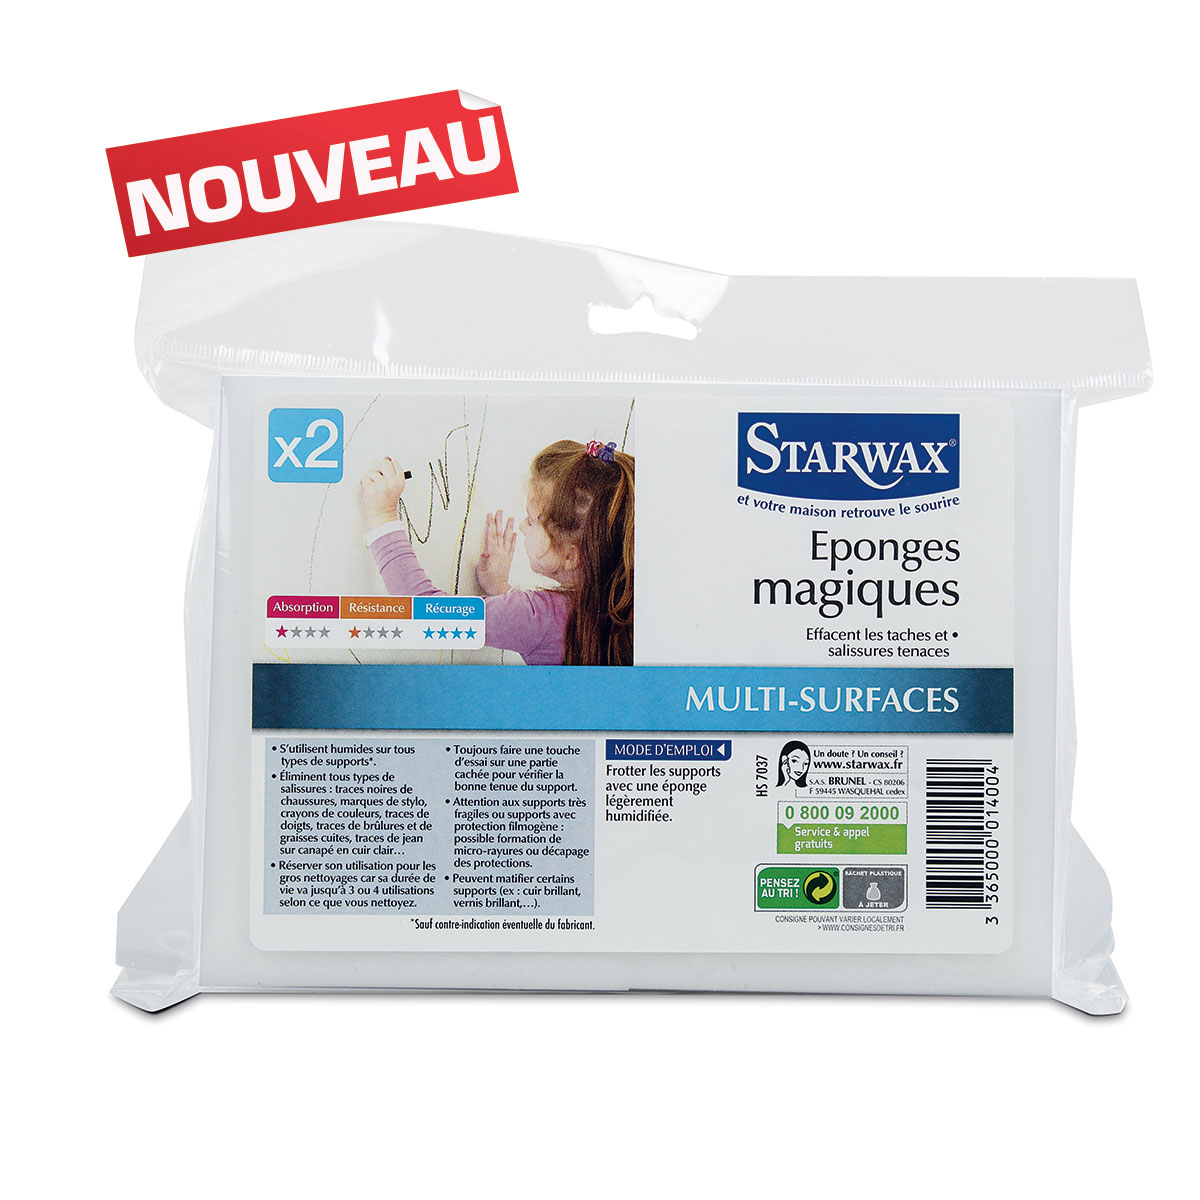 Eponges magiques - Starwax